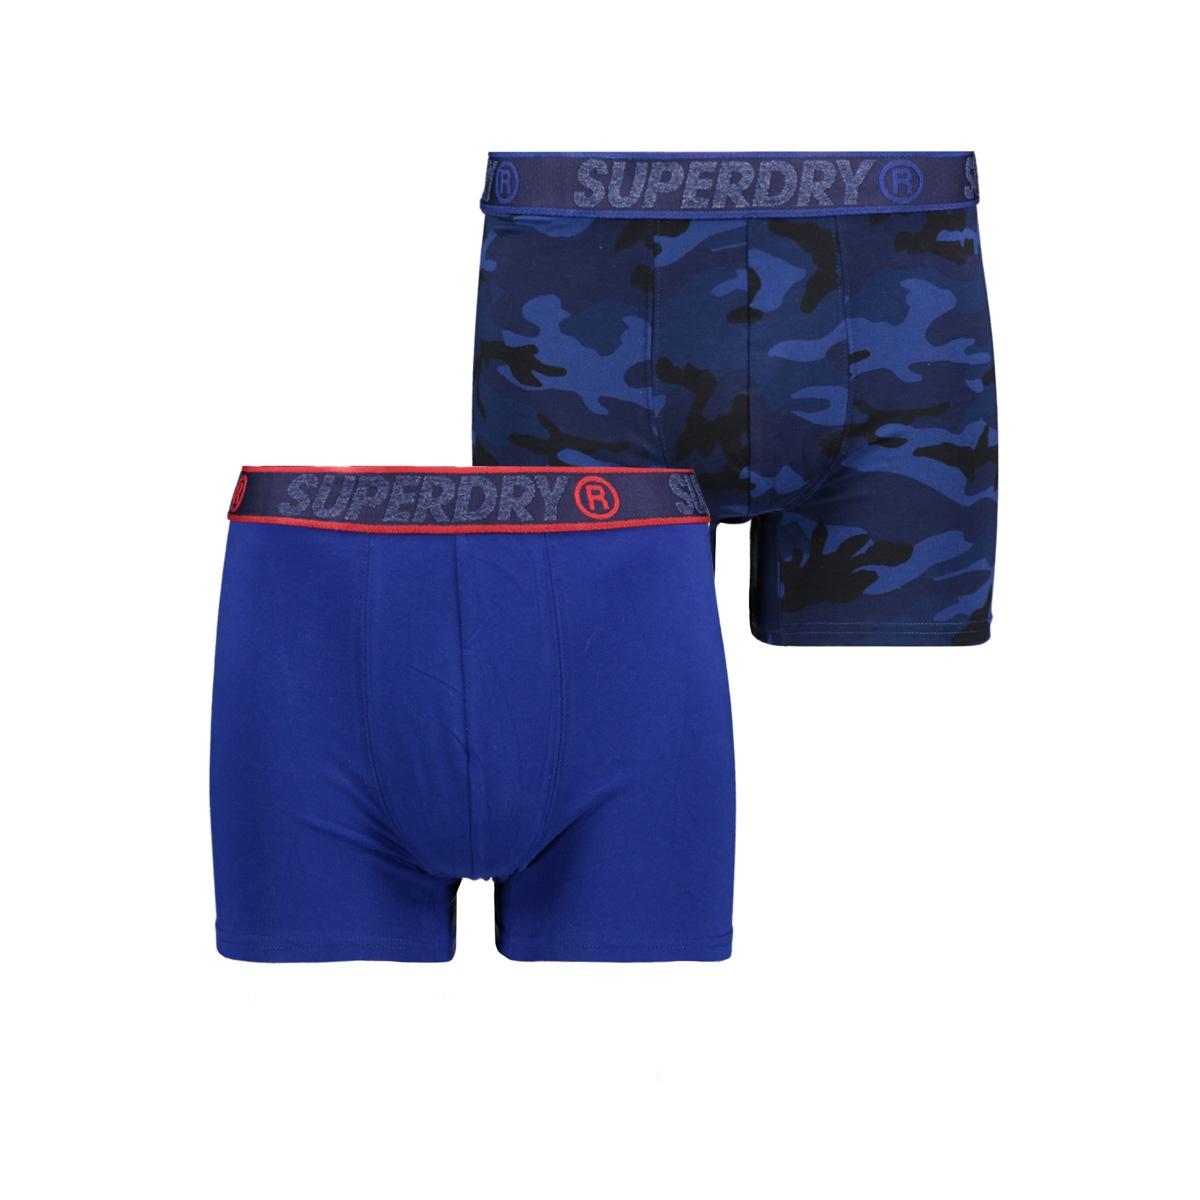 boxer dubble pack m3110001a superdry ondergoed camo